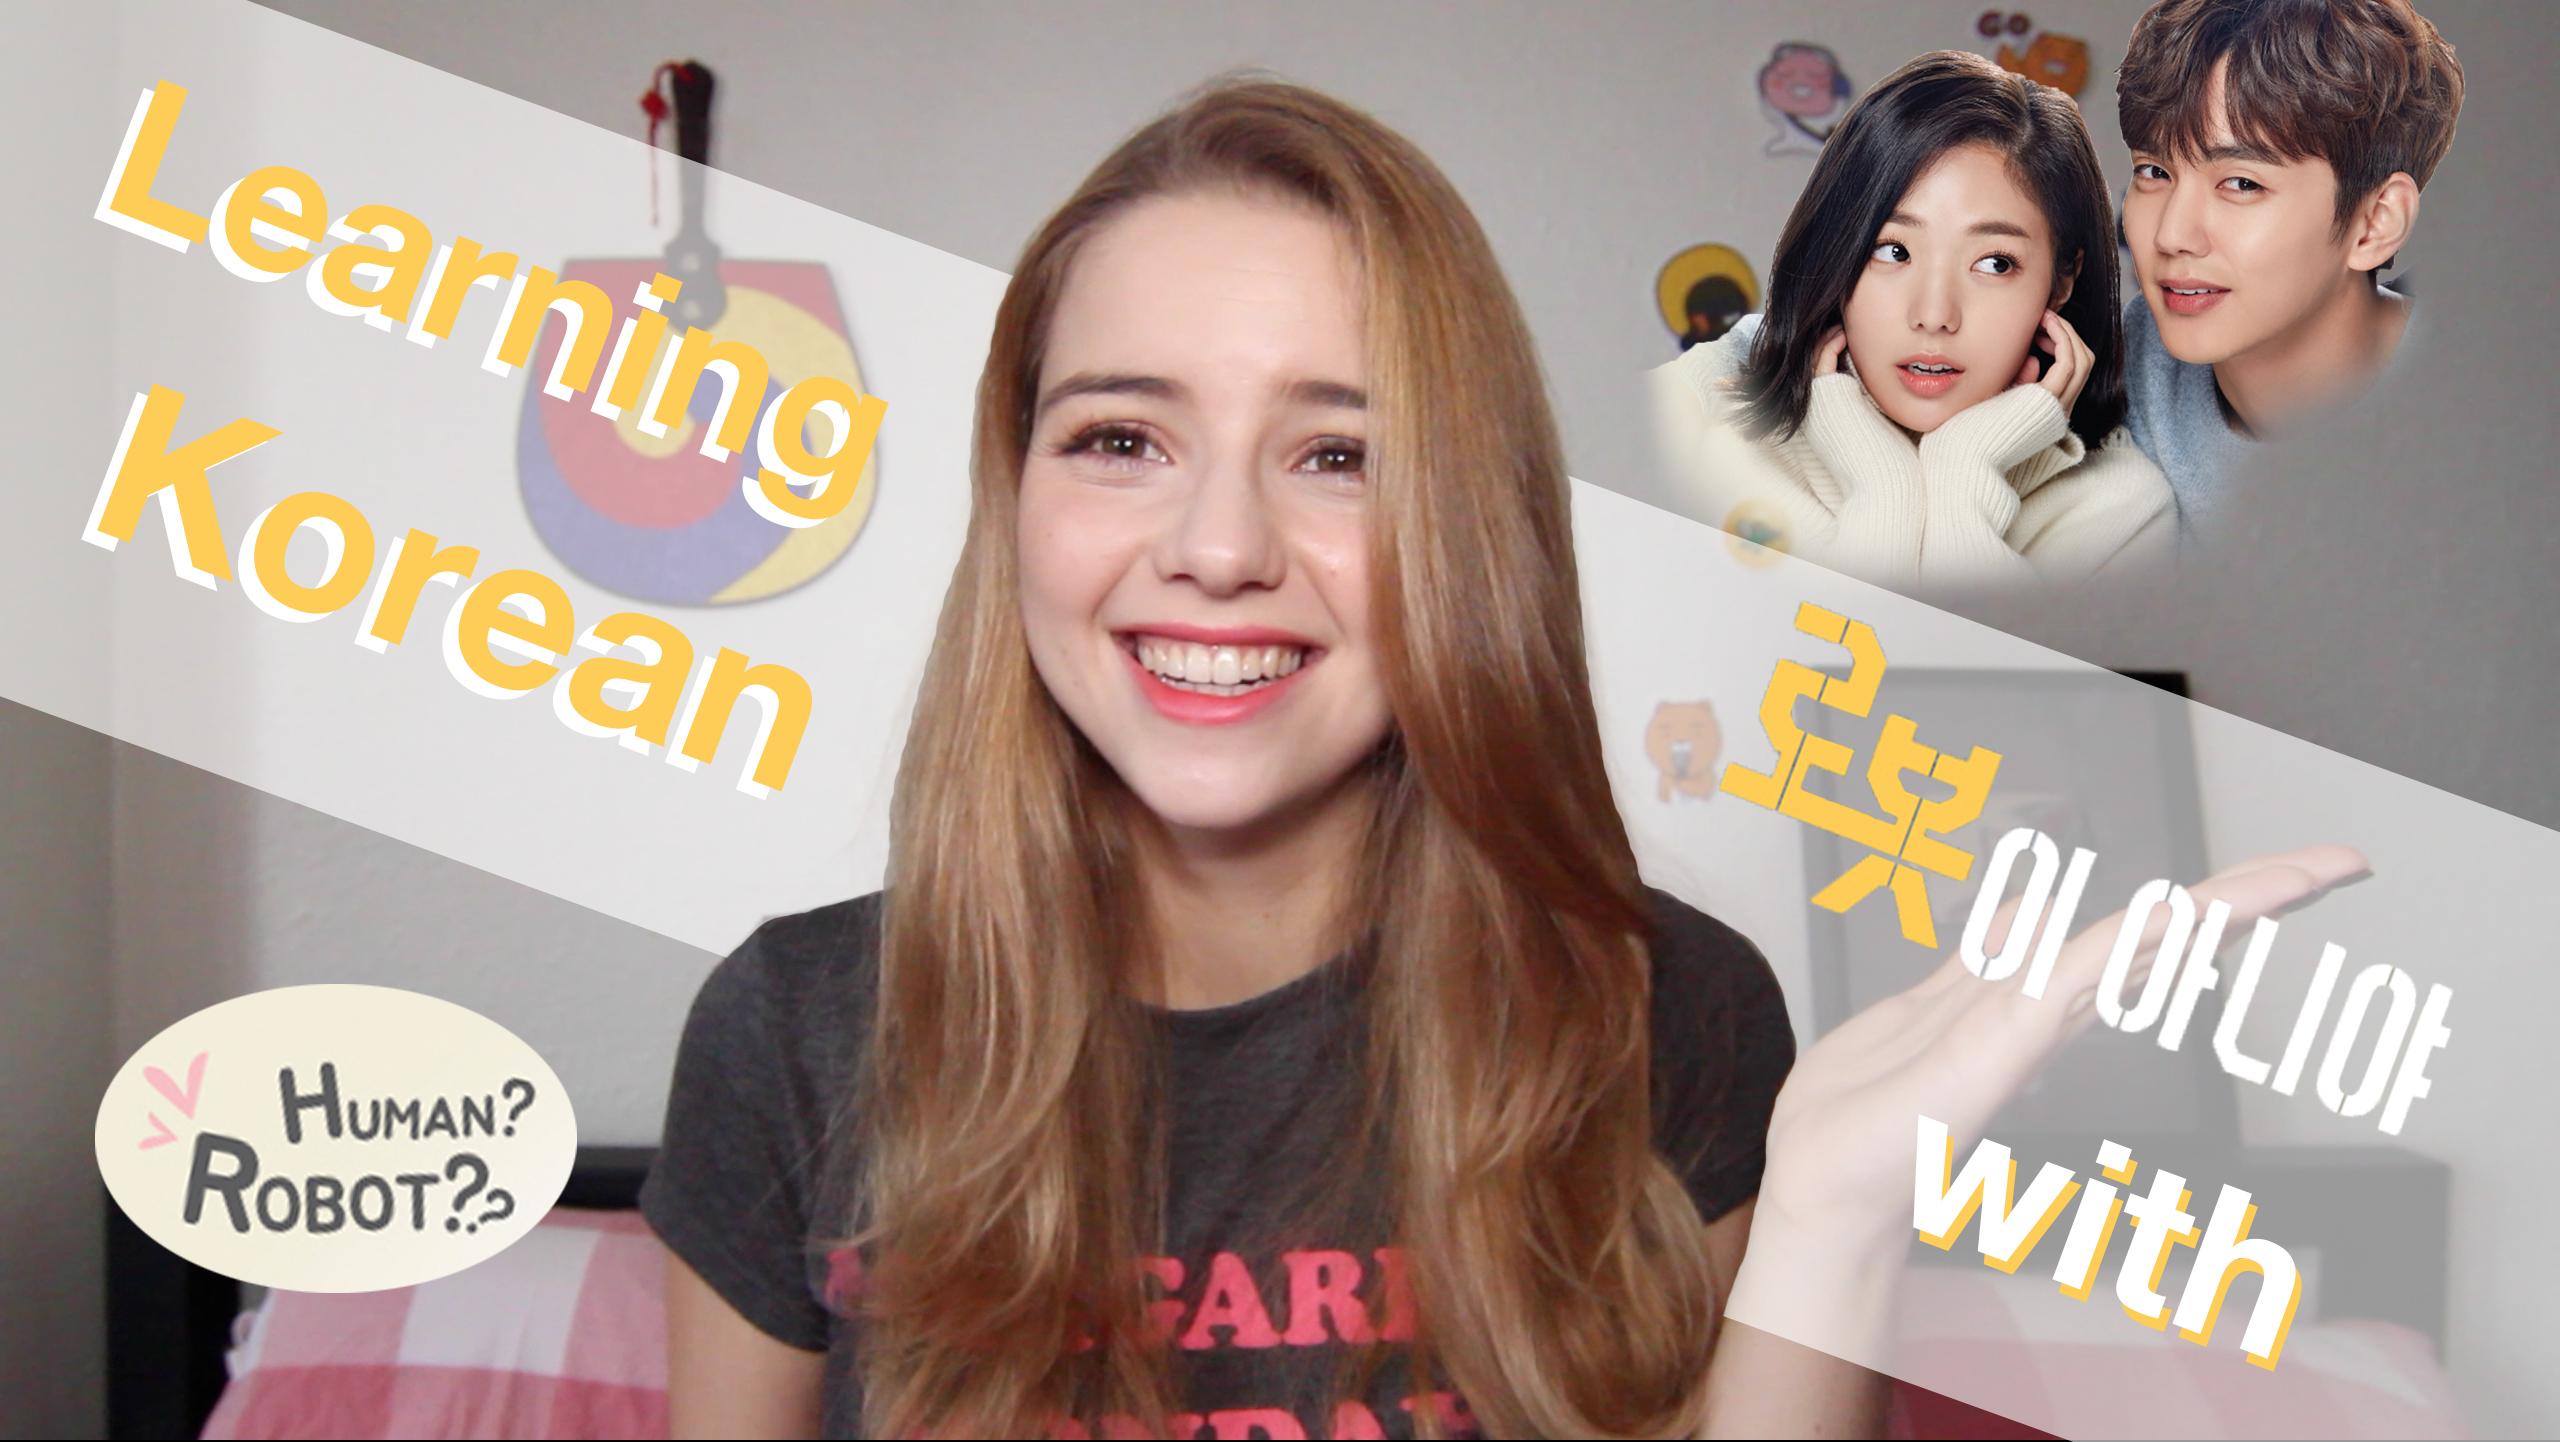 Margarita 第 21集: Learn Korean with 로봇이 아니야!